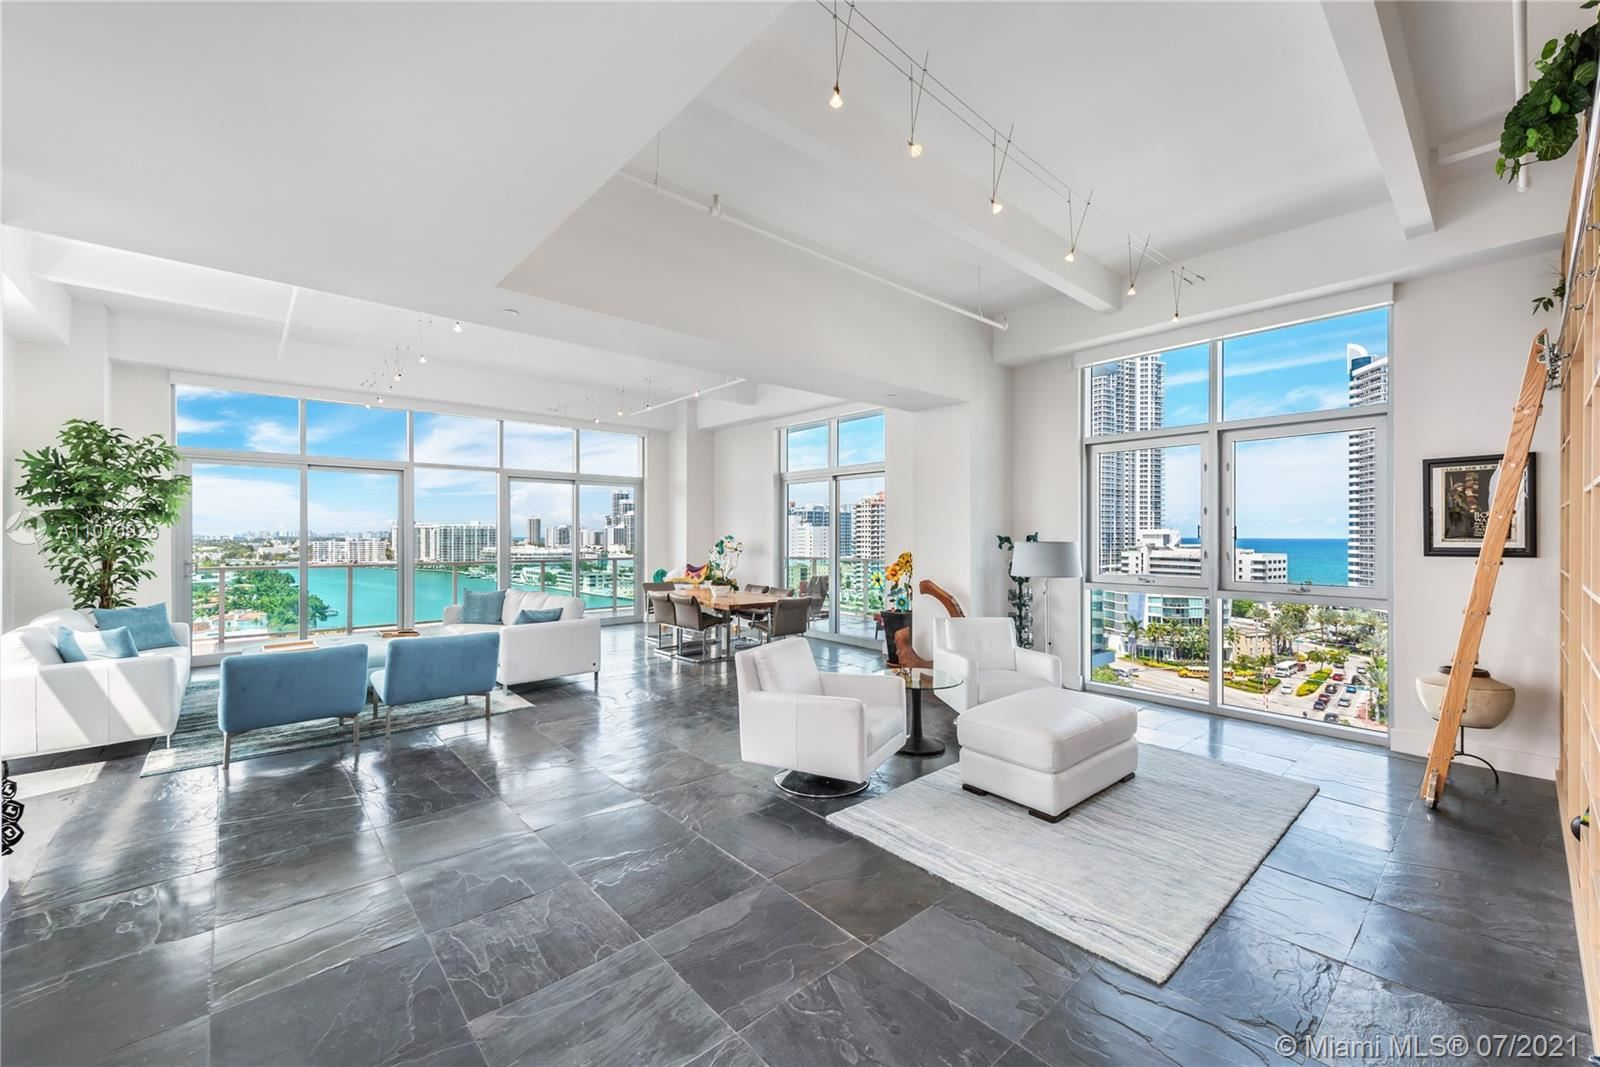 201 Aqua Ave #1002, Miami Beach, FL 33141 - #: A11070923